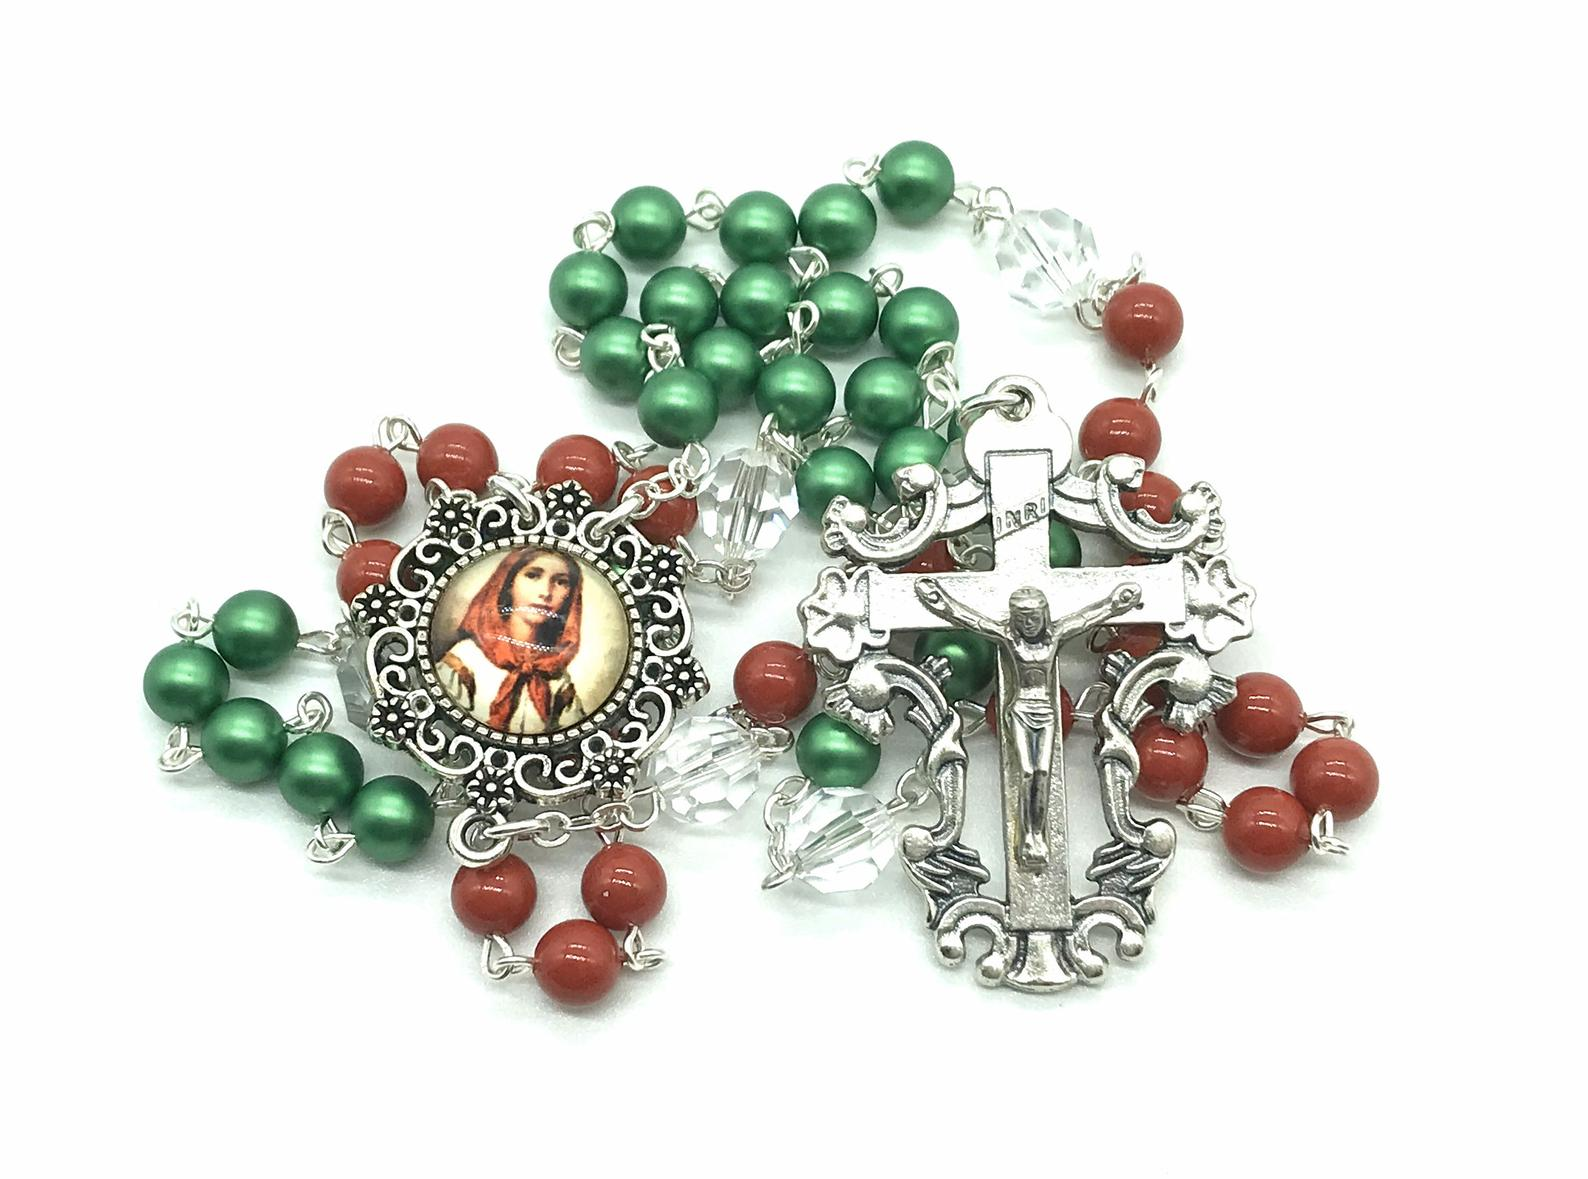 2020 0713 TWalsh St Dymphna rosary